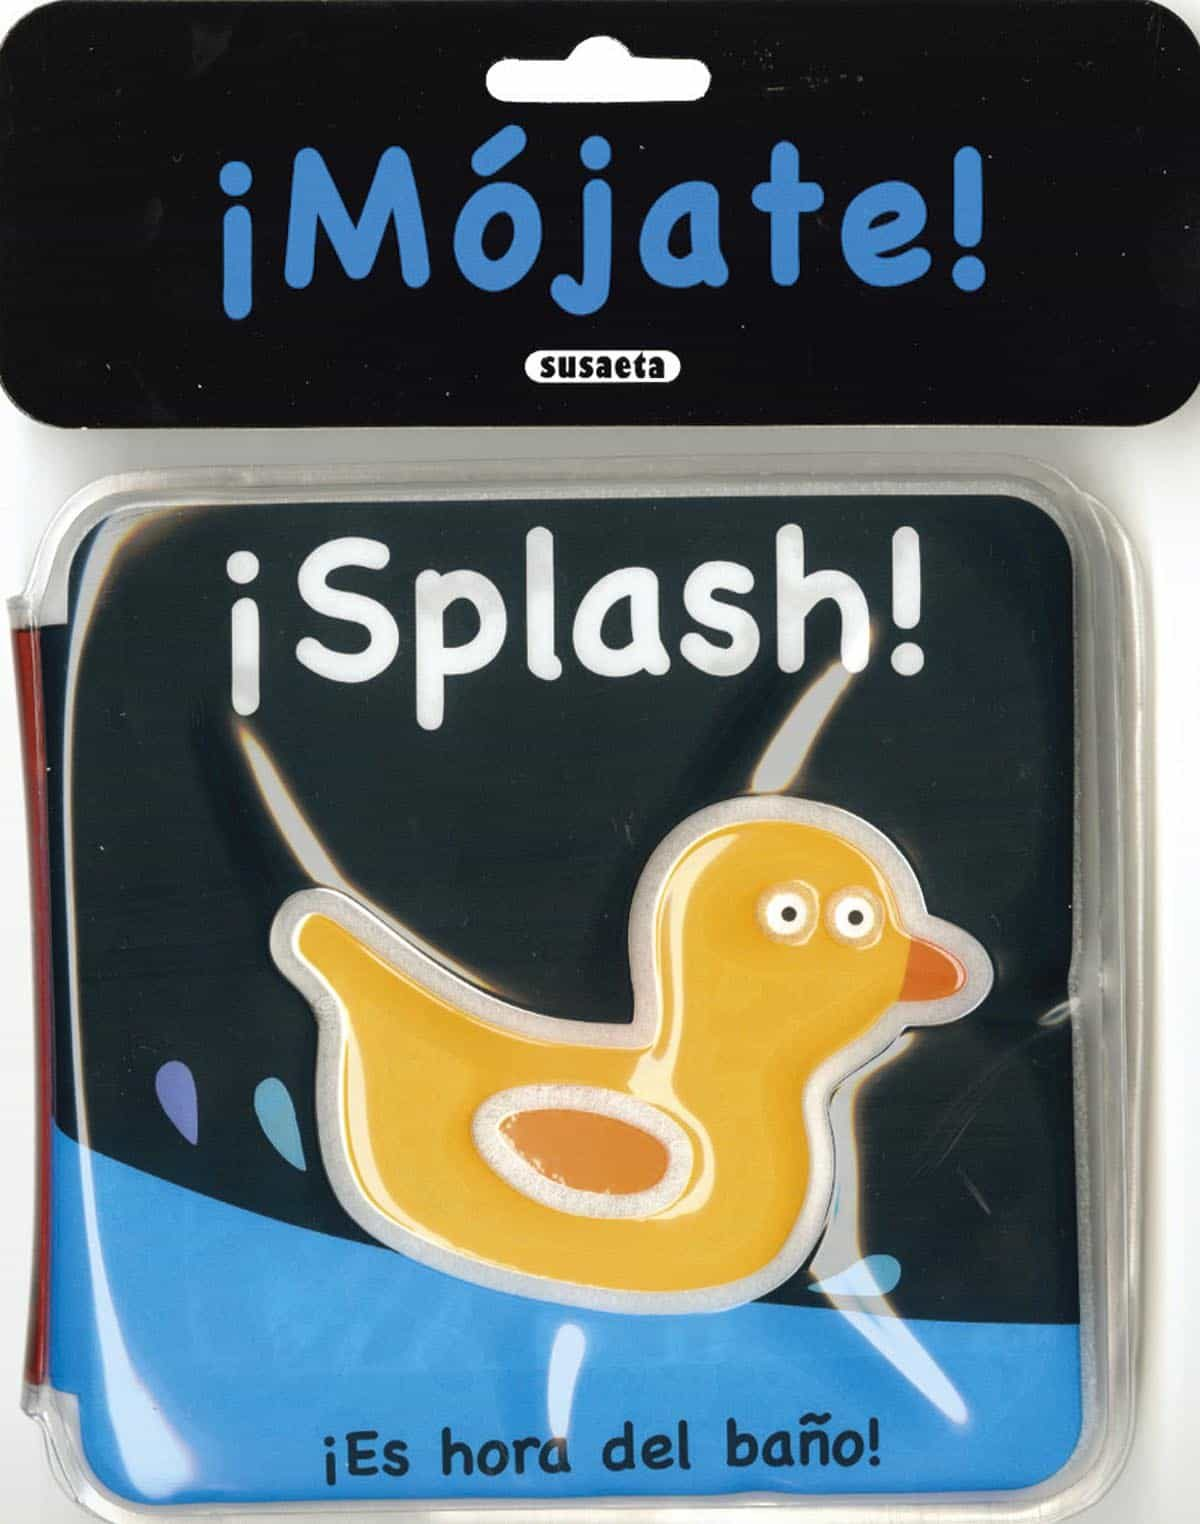 ¡splash! - Vv.aa.